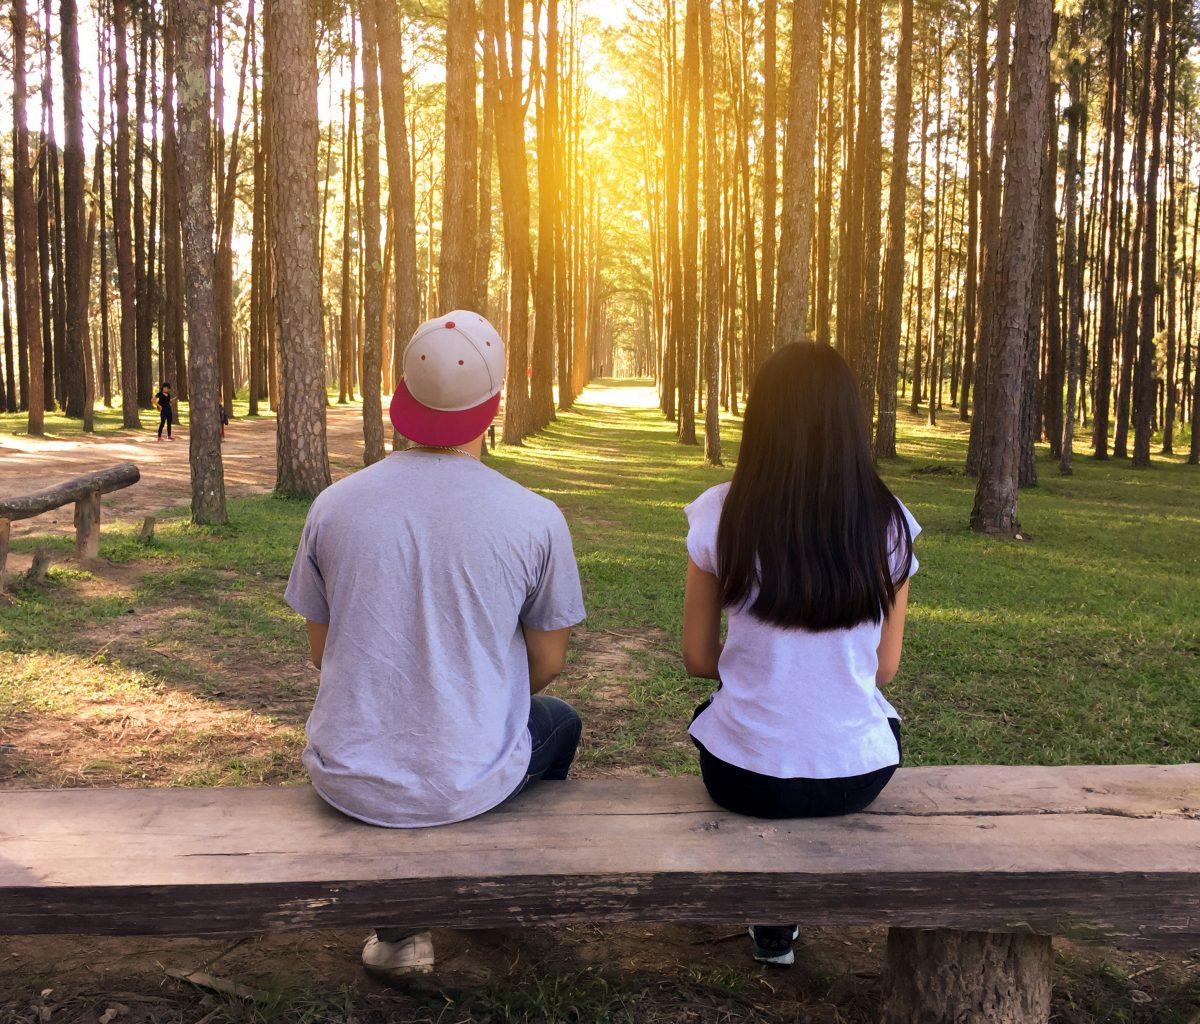 isfjs και dating Φιλιππίνων Cebuana ιστοσελίδα γνωριμιών